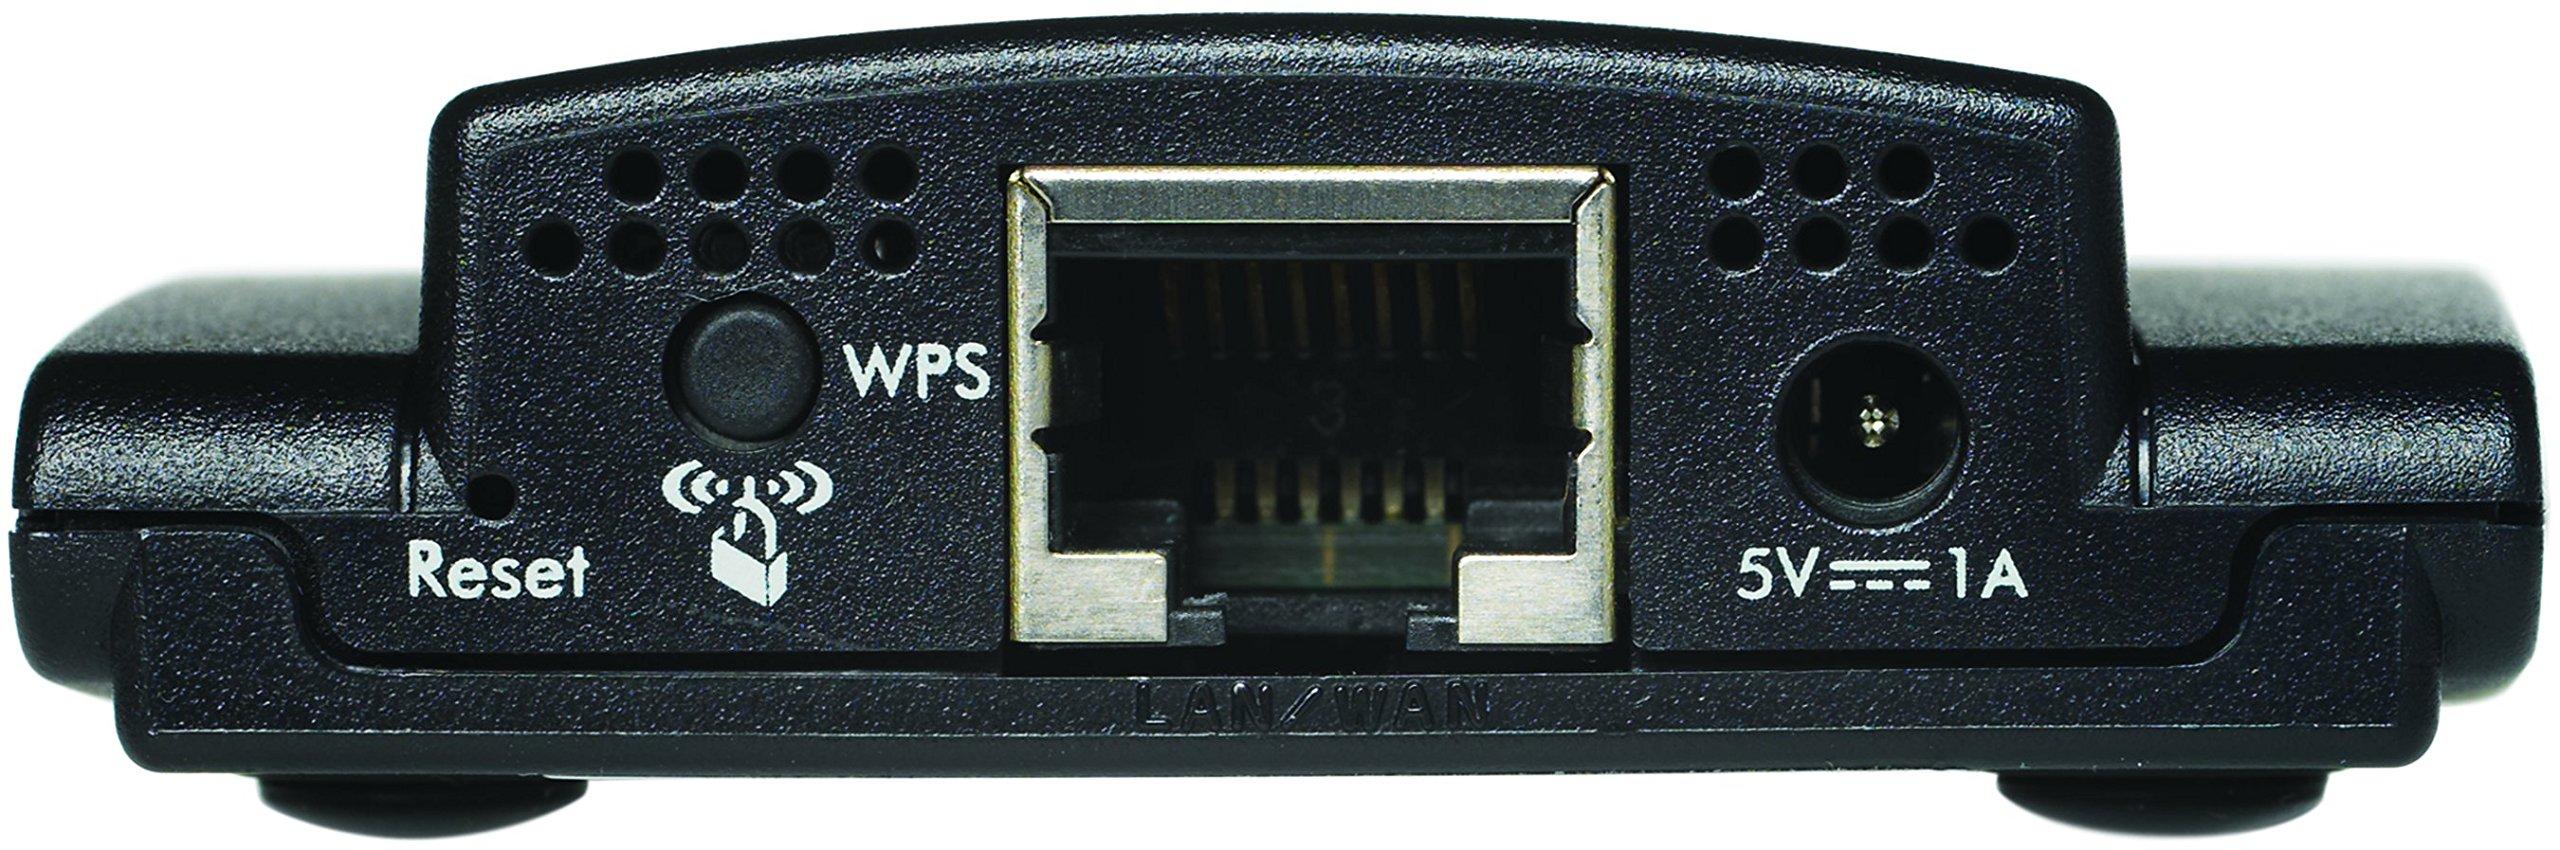 NETGEAR Universal N300 Wi-Fi to Ethernet Adapter (WNCE2001) by NETGEAR (Image #5)